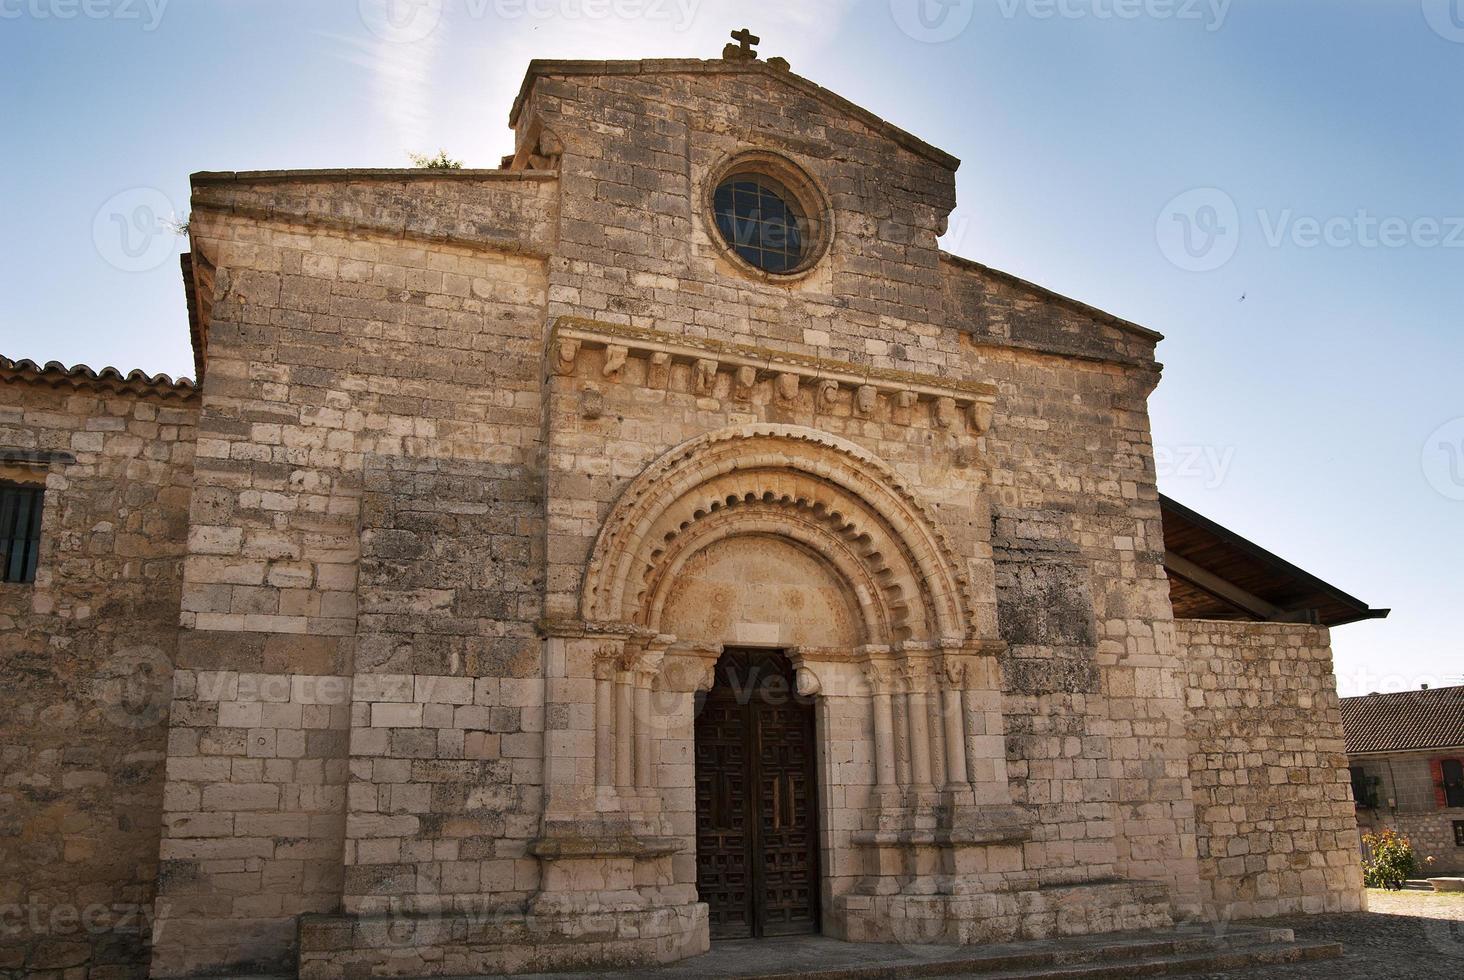 kerk van wamba in spanje foto